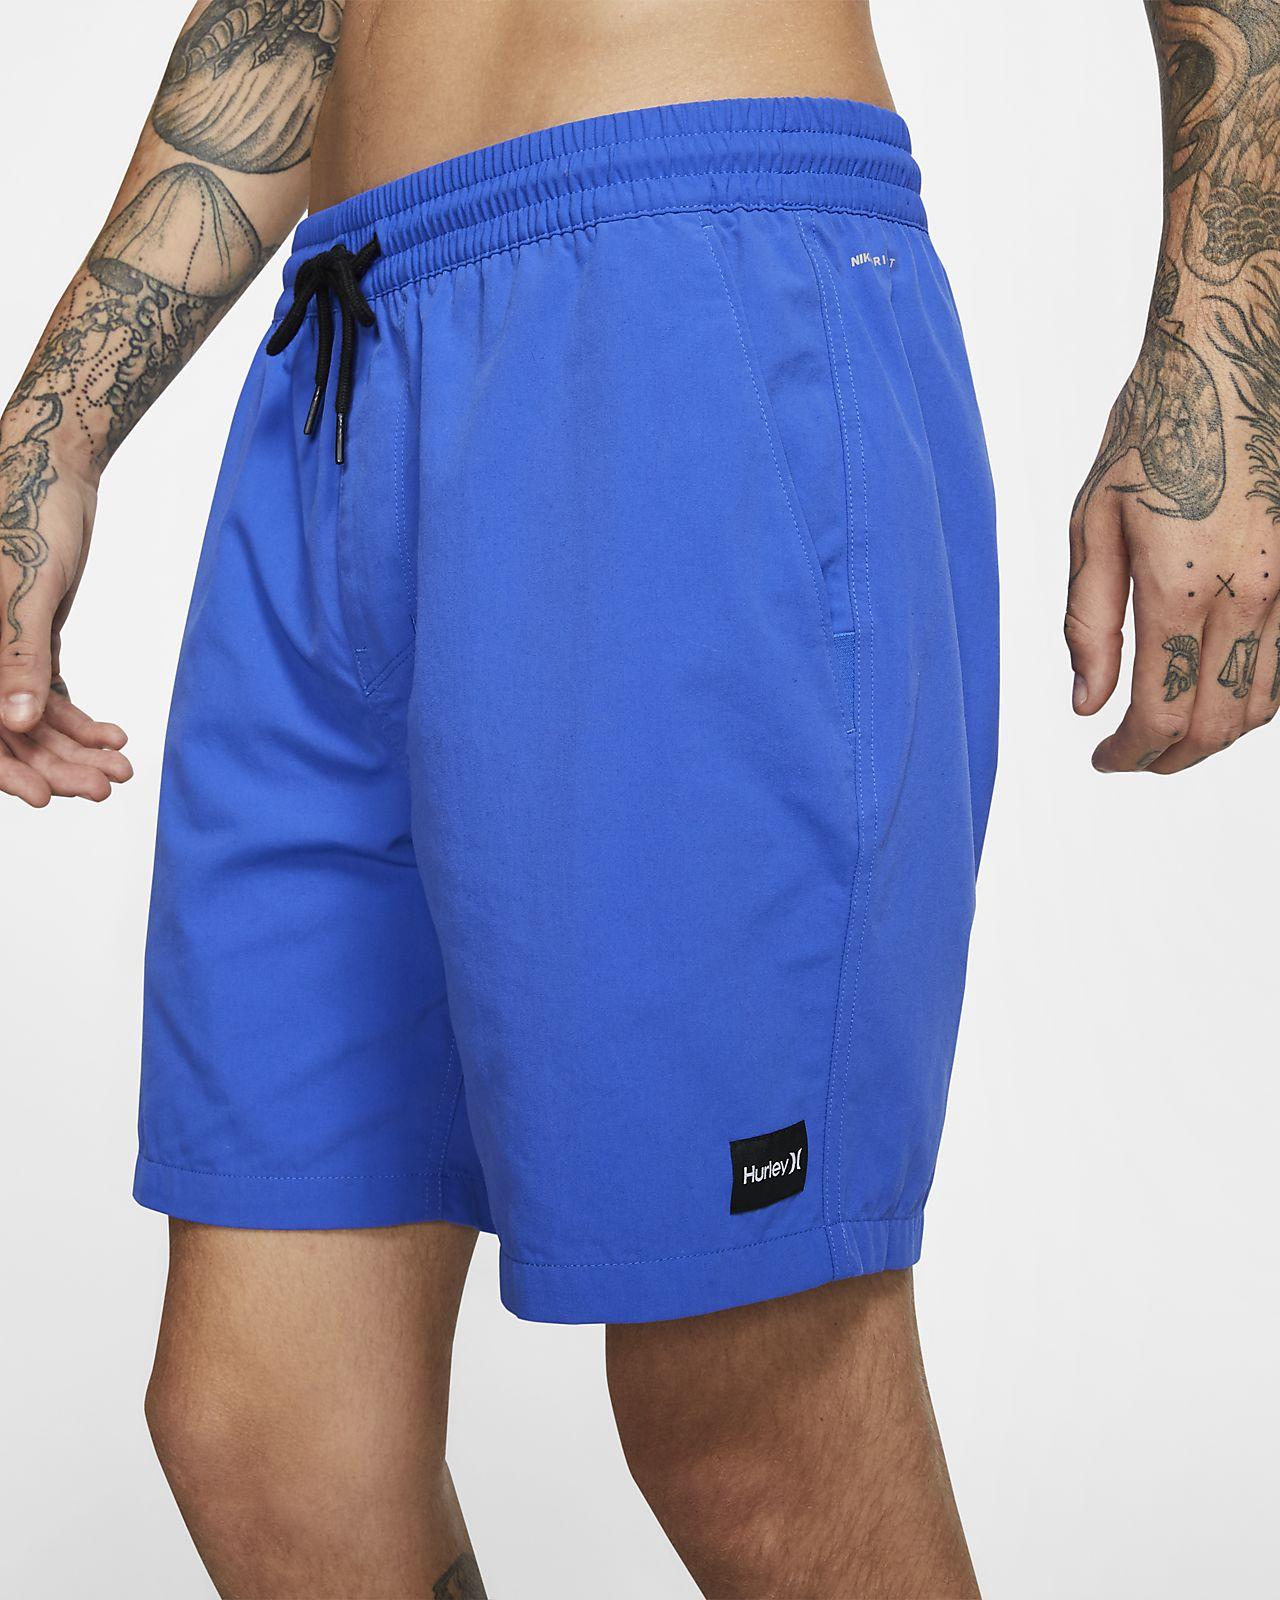 Shorts de 43 cm para hombre Hurley Dri-FIT Convoy Volley